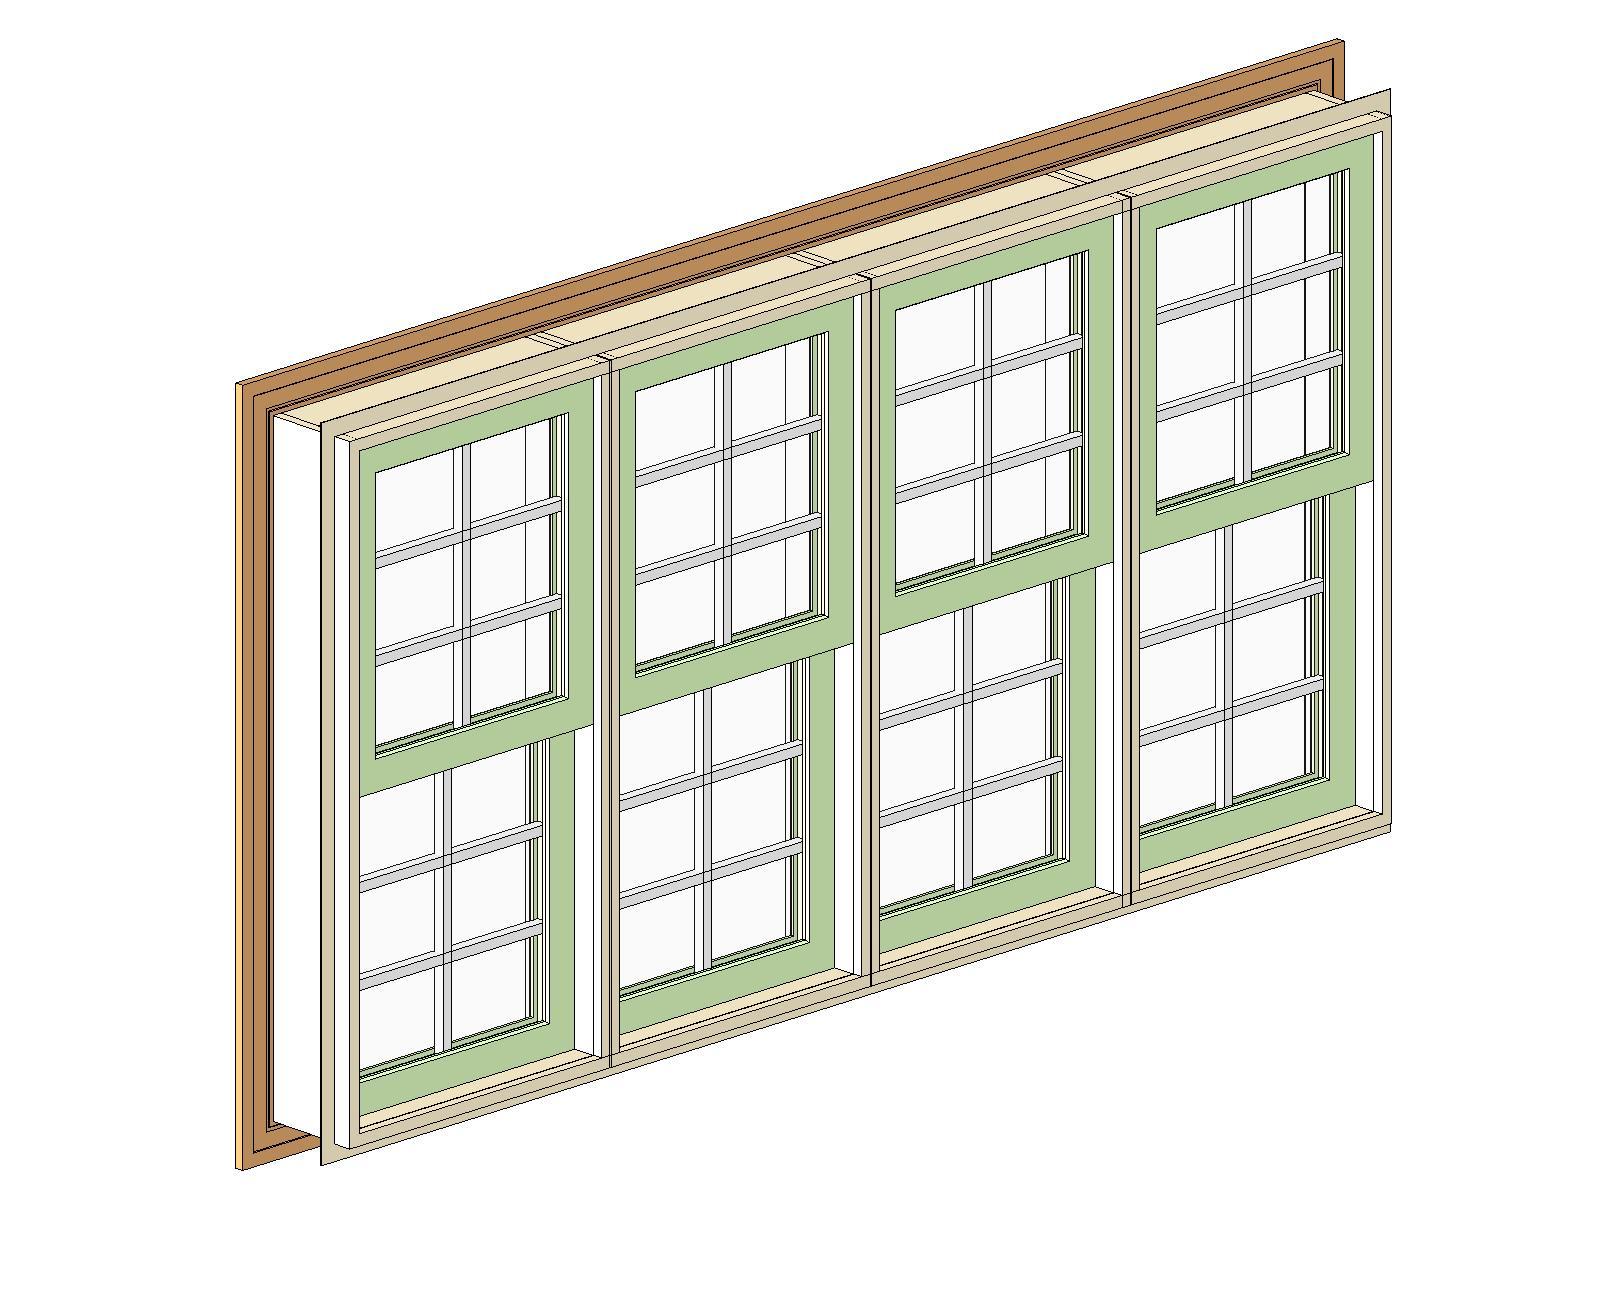 Double Mulled Window : Bim objects families